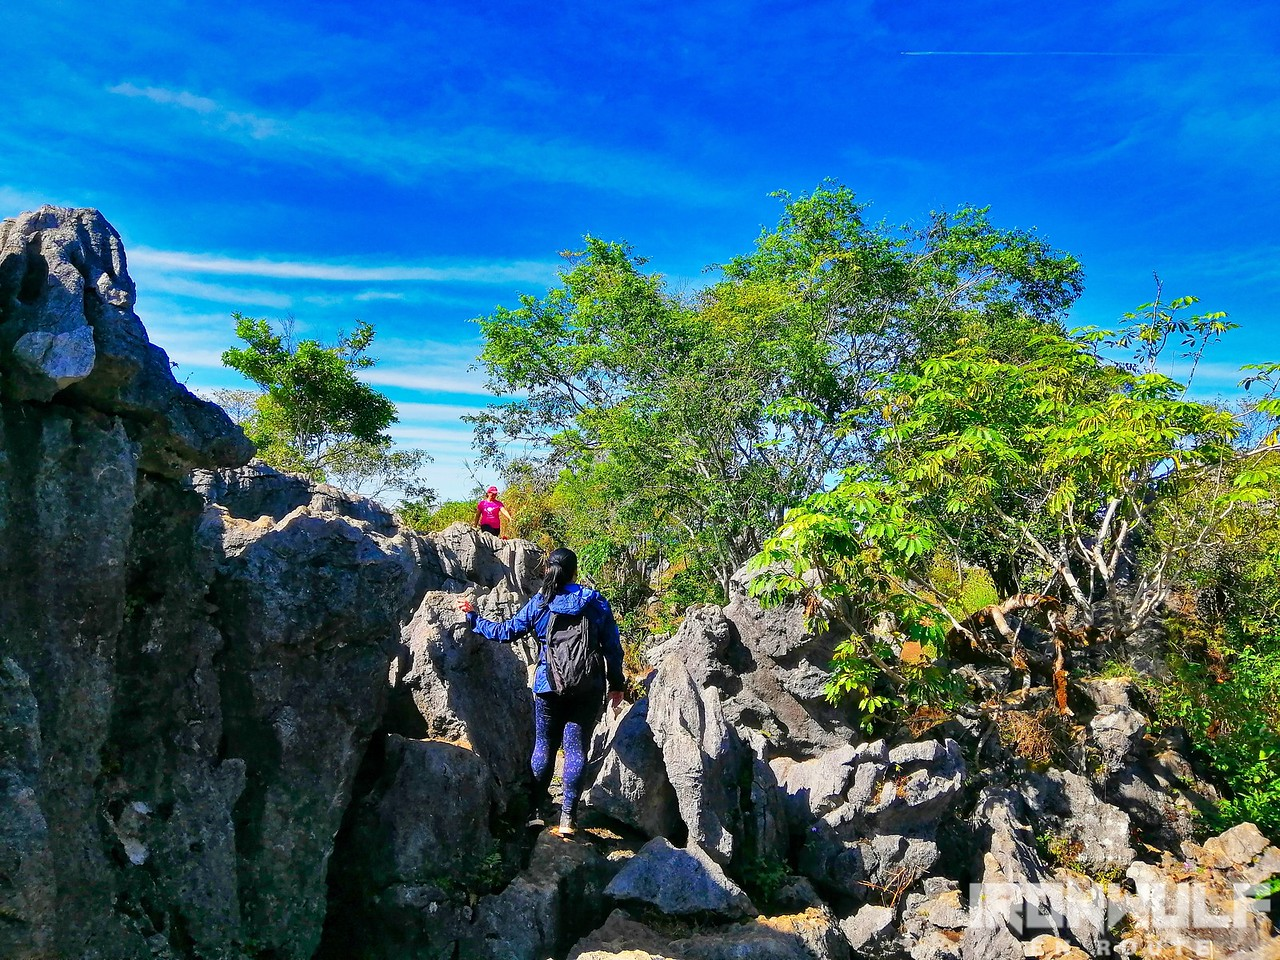 Scrambling over the limestone rocks